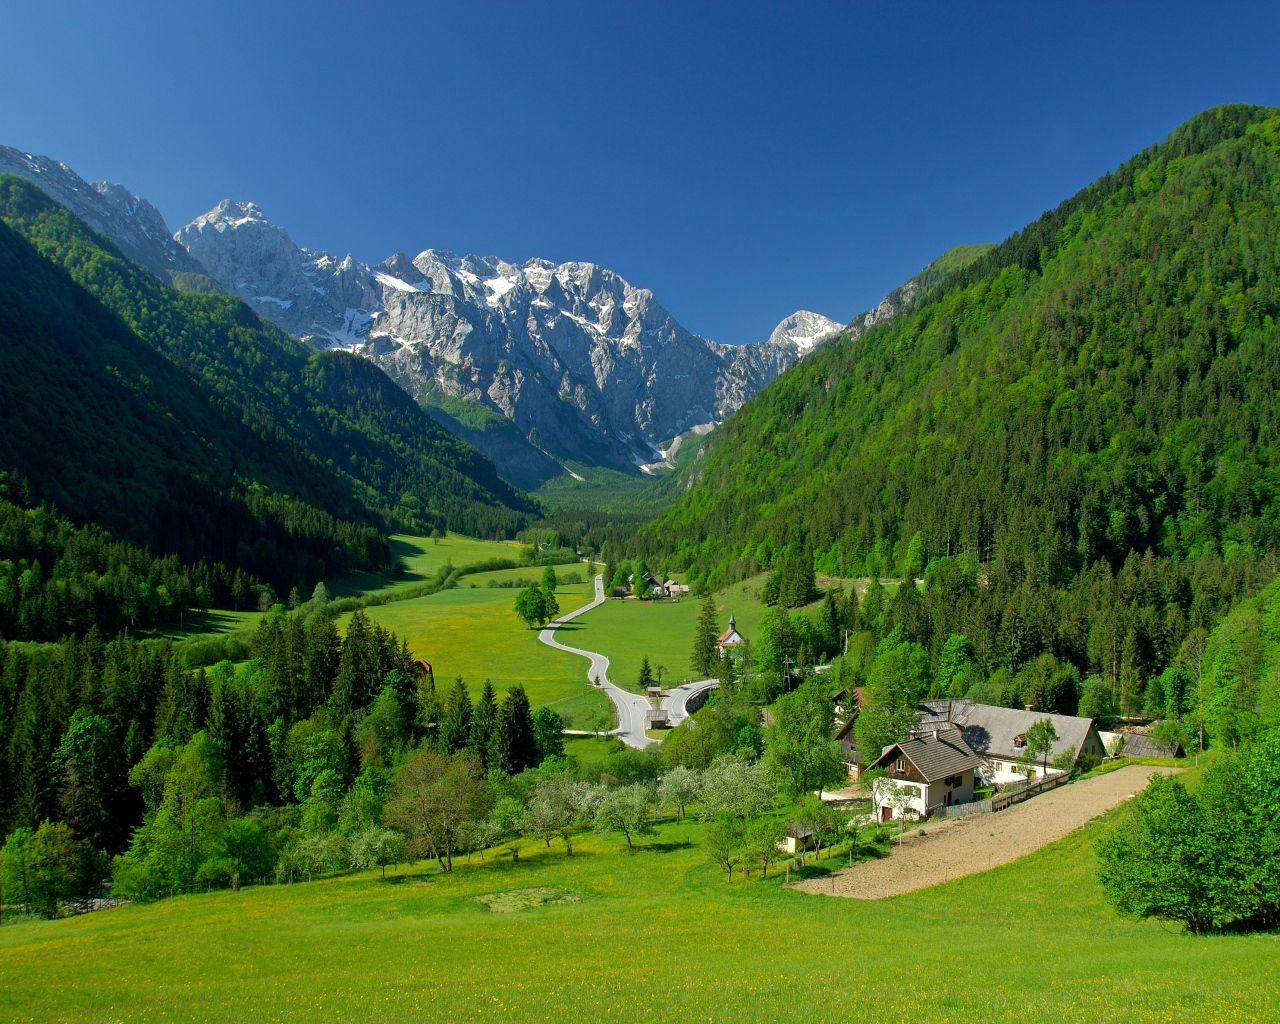 Alpine Valley Mountains Fields Lindas Paisagens Lugares Bonitos Lugares Para Viajar